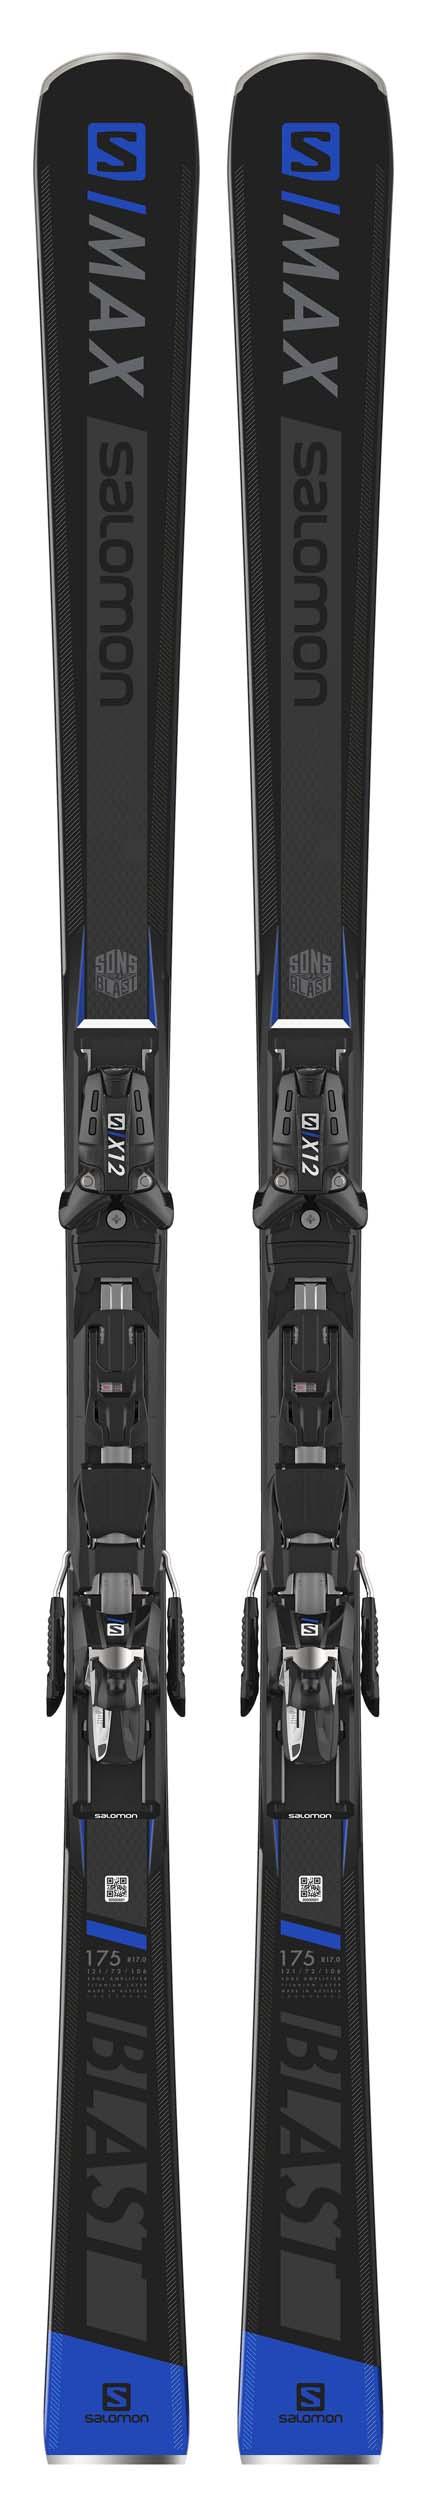 Salomon 2019 S/Max Blast Skis w/X12 TL Bindings NEW !! 165cm